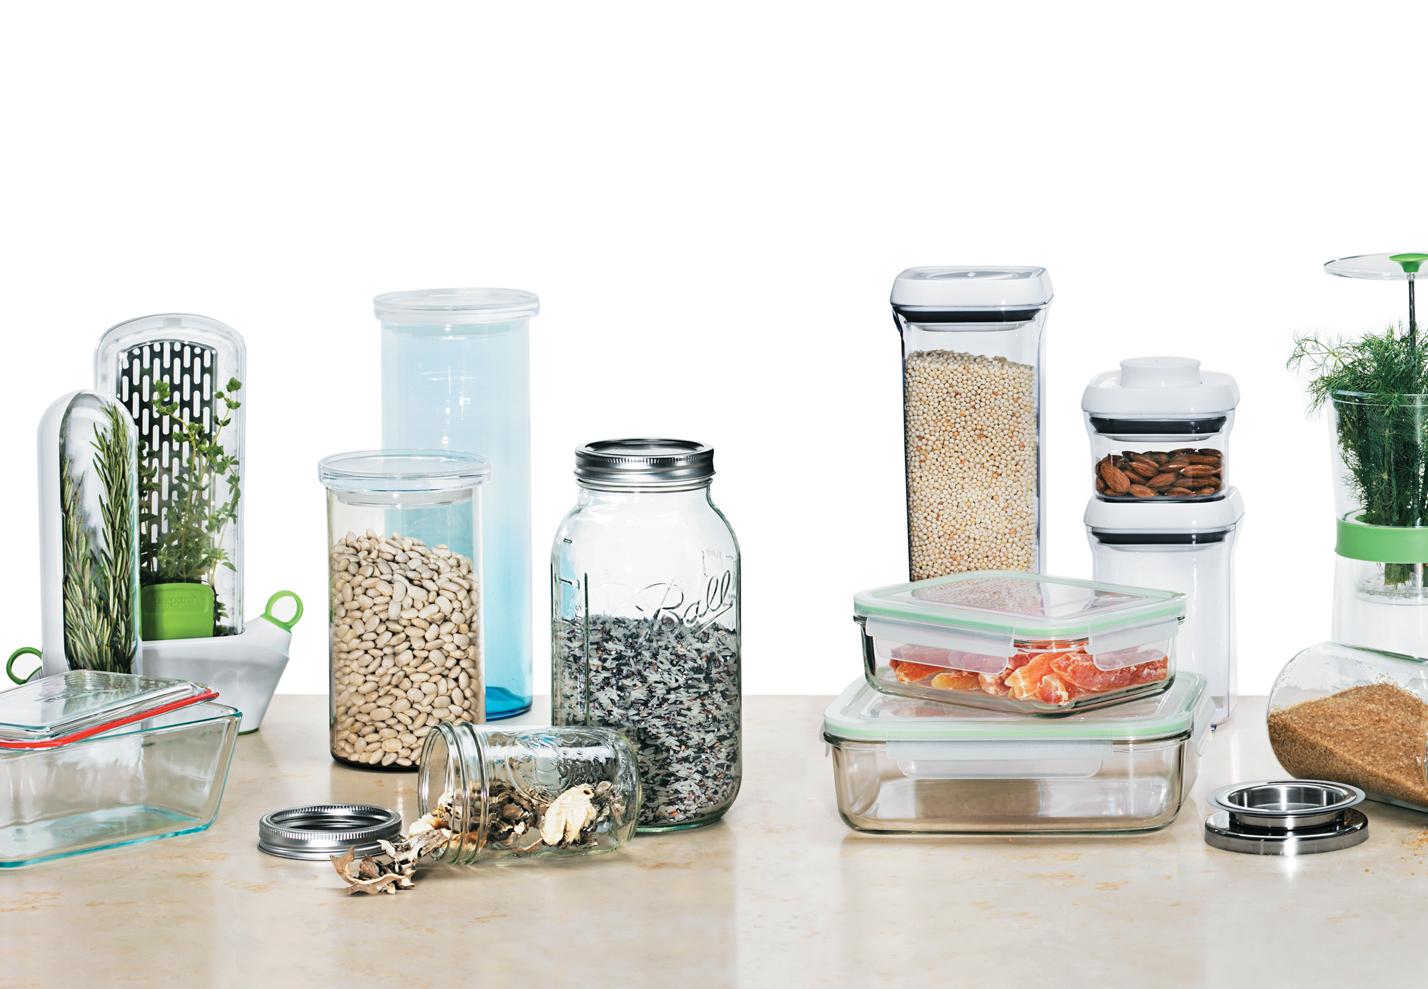 dwell reports food storage